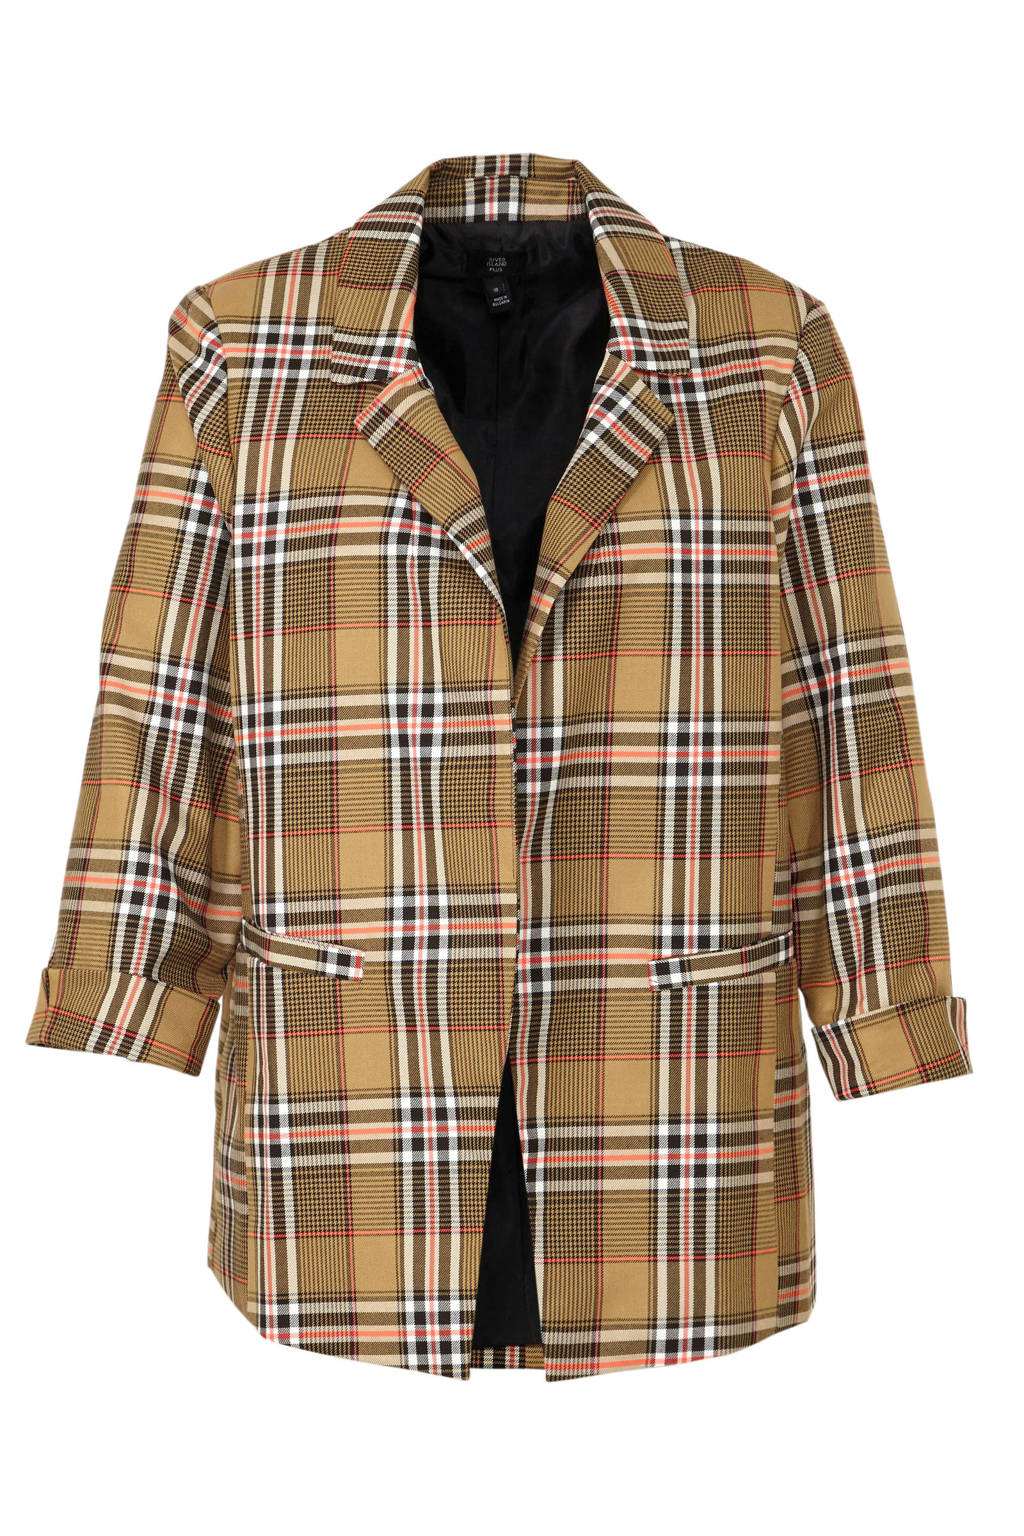 River Island Plus geruite blazer beige/bruin/roze, Beige/bruin/roze